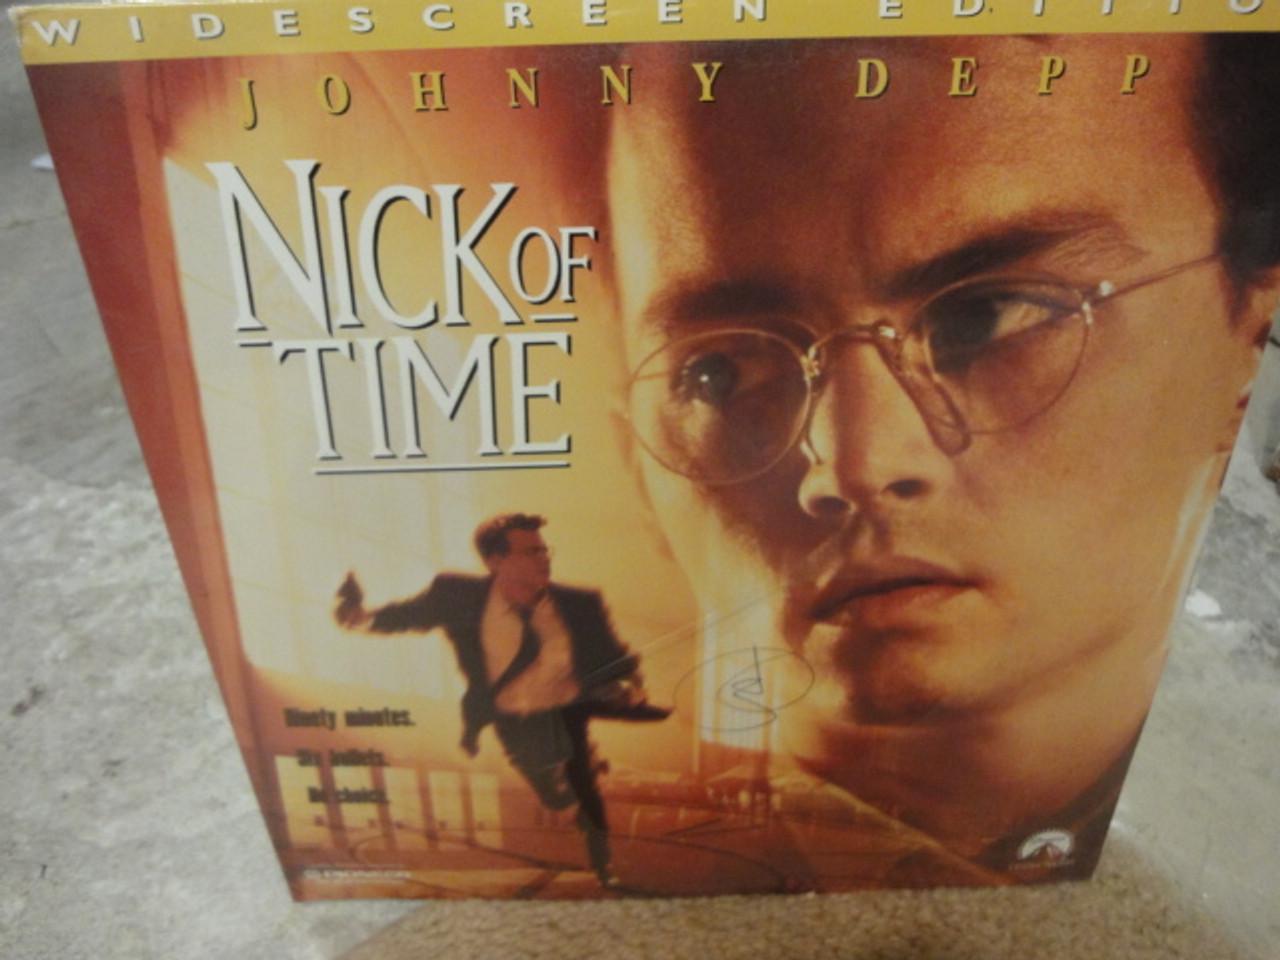 "Depp, Johnny ""Nick Of Time"" Sealed Laserdisc Laser Disc LP Signed Autograph Color Photos"